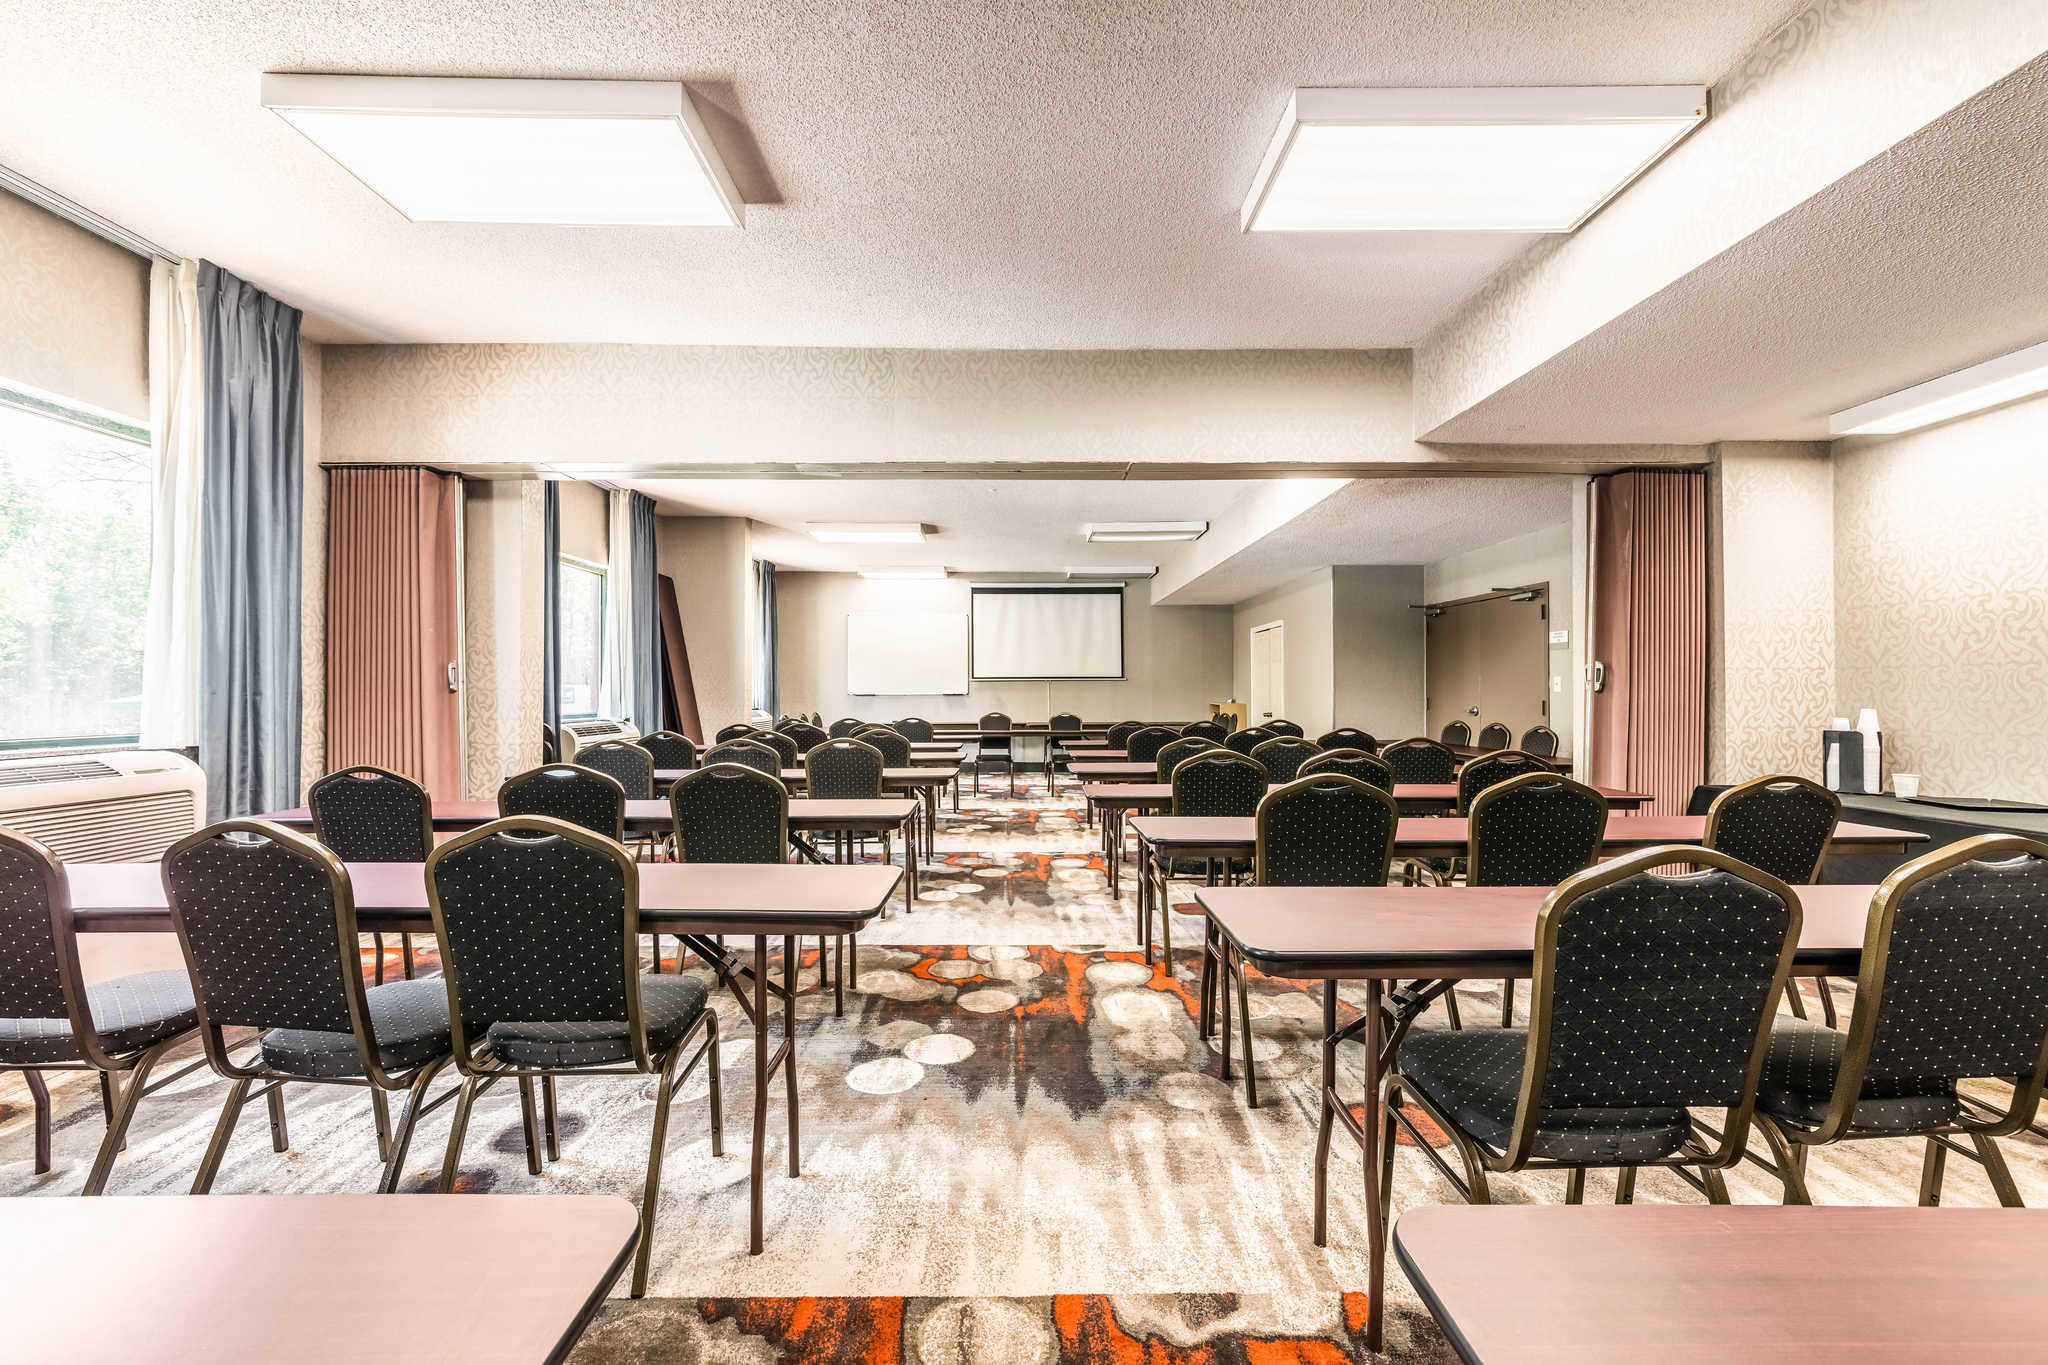 Clarion Inn & Suites image 41